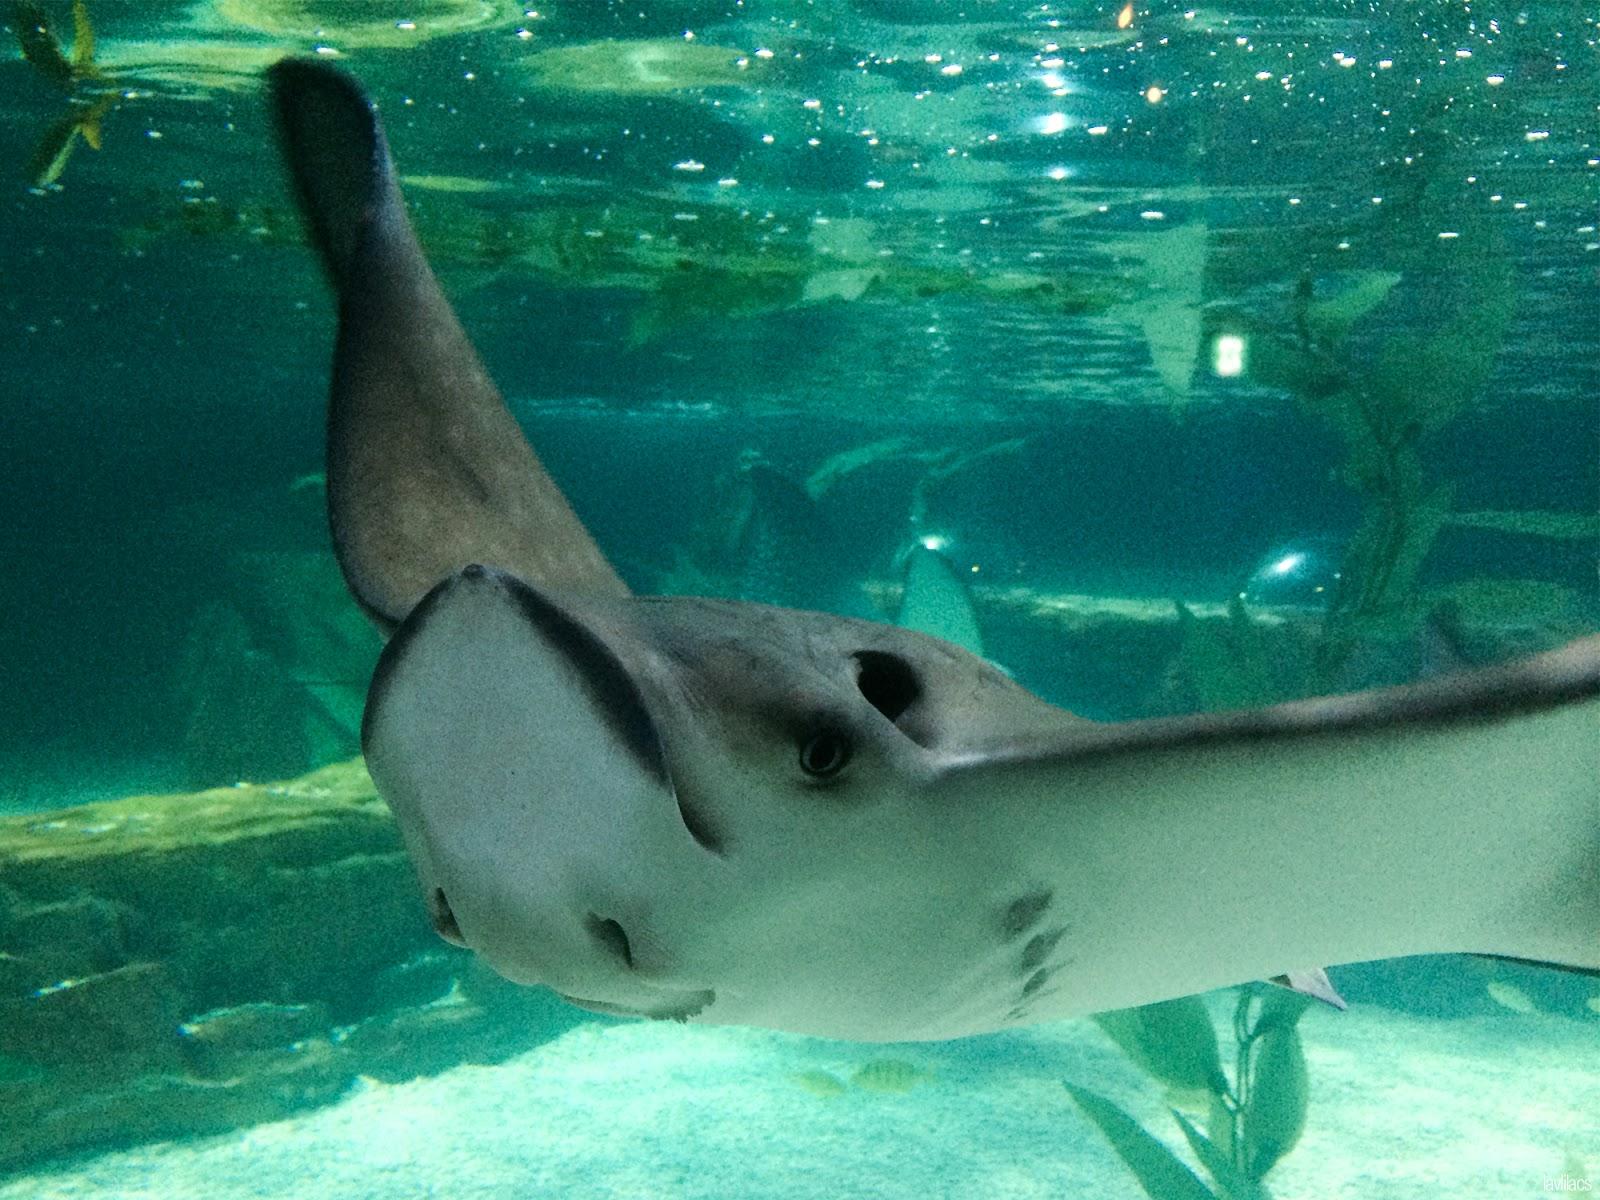 Seoul, Korea - Summer Study Abroad 2014 - Sea Life Busan Aquarium stingray